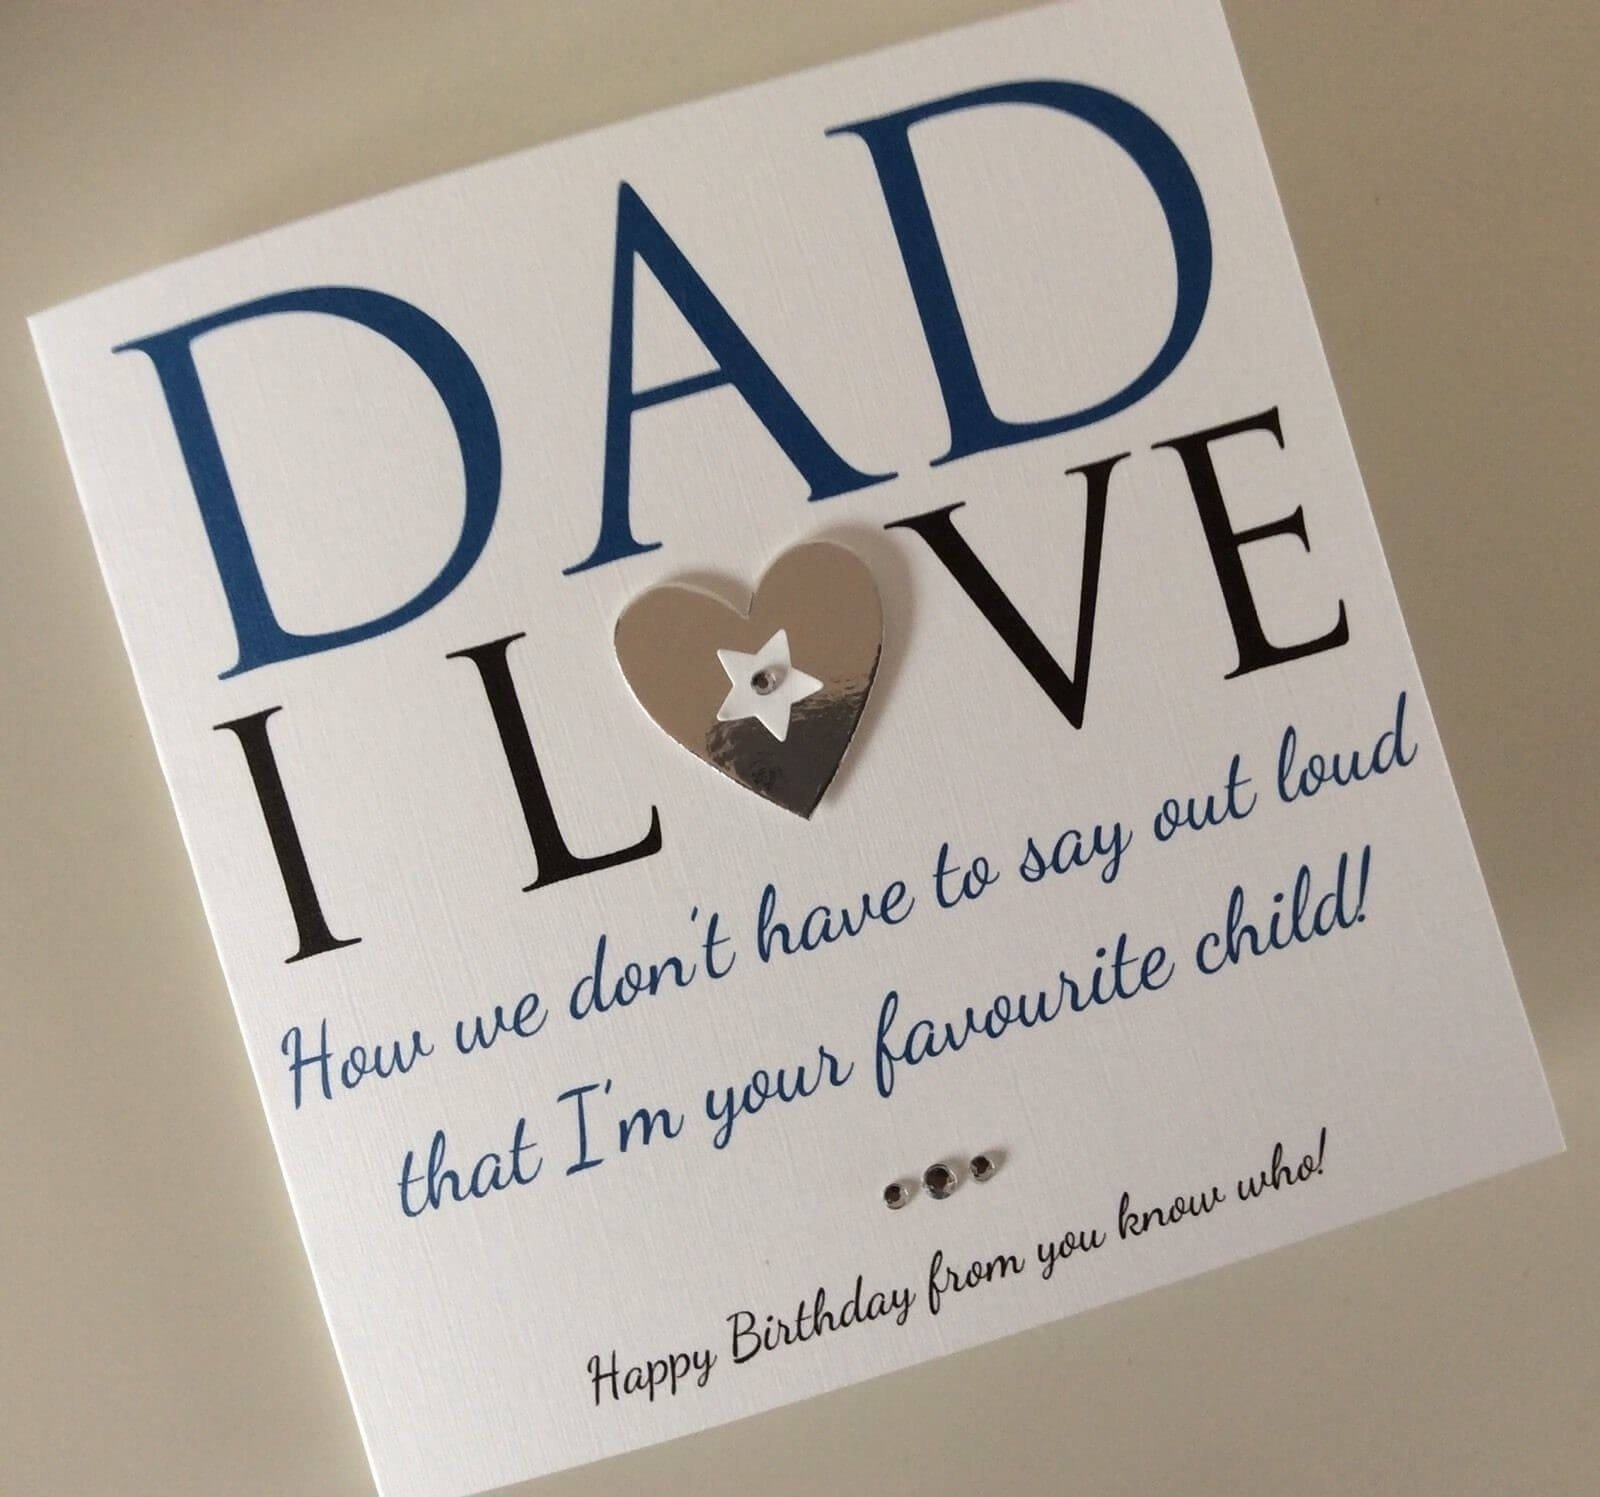 10 Trendy Cool Ideas For Birthday Cards good birthday card ideas for dad mavraievie 1 2021